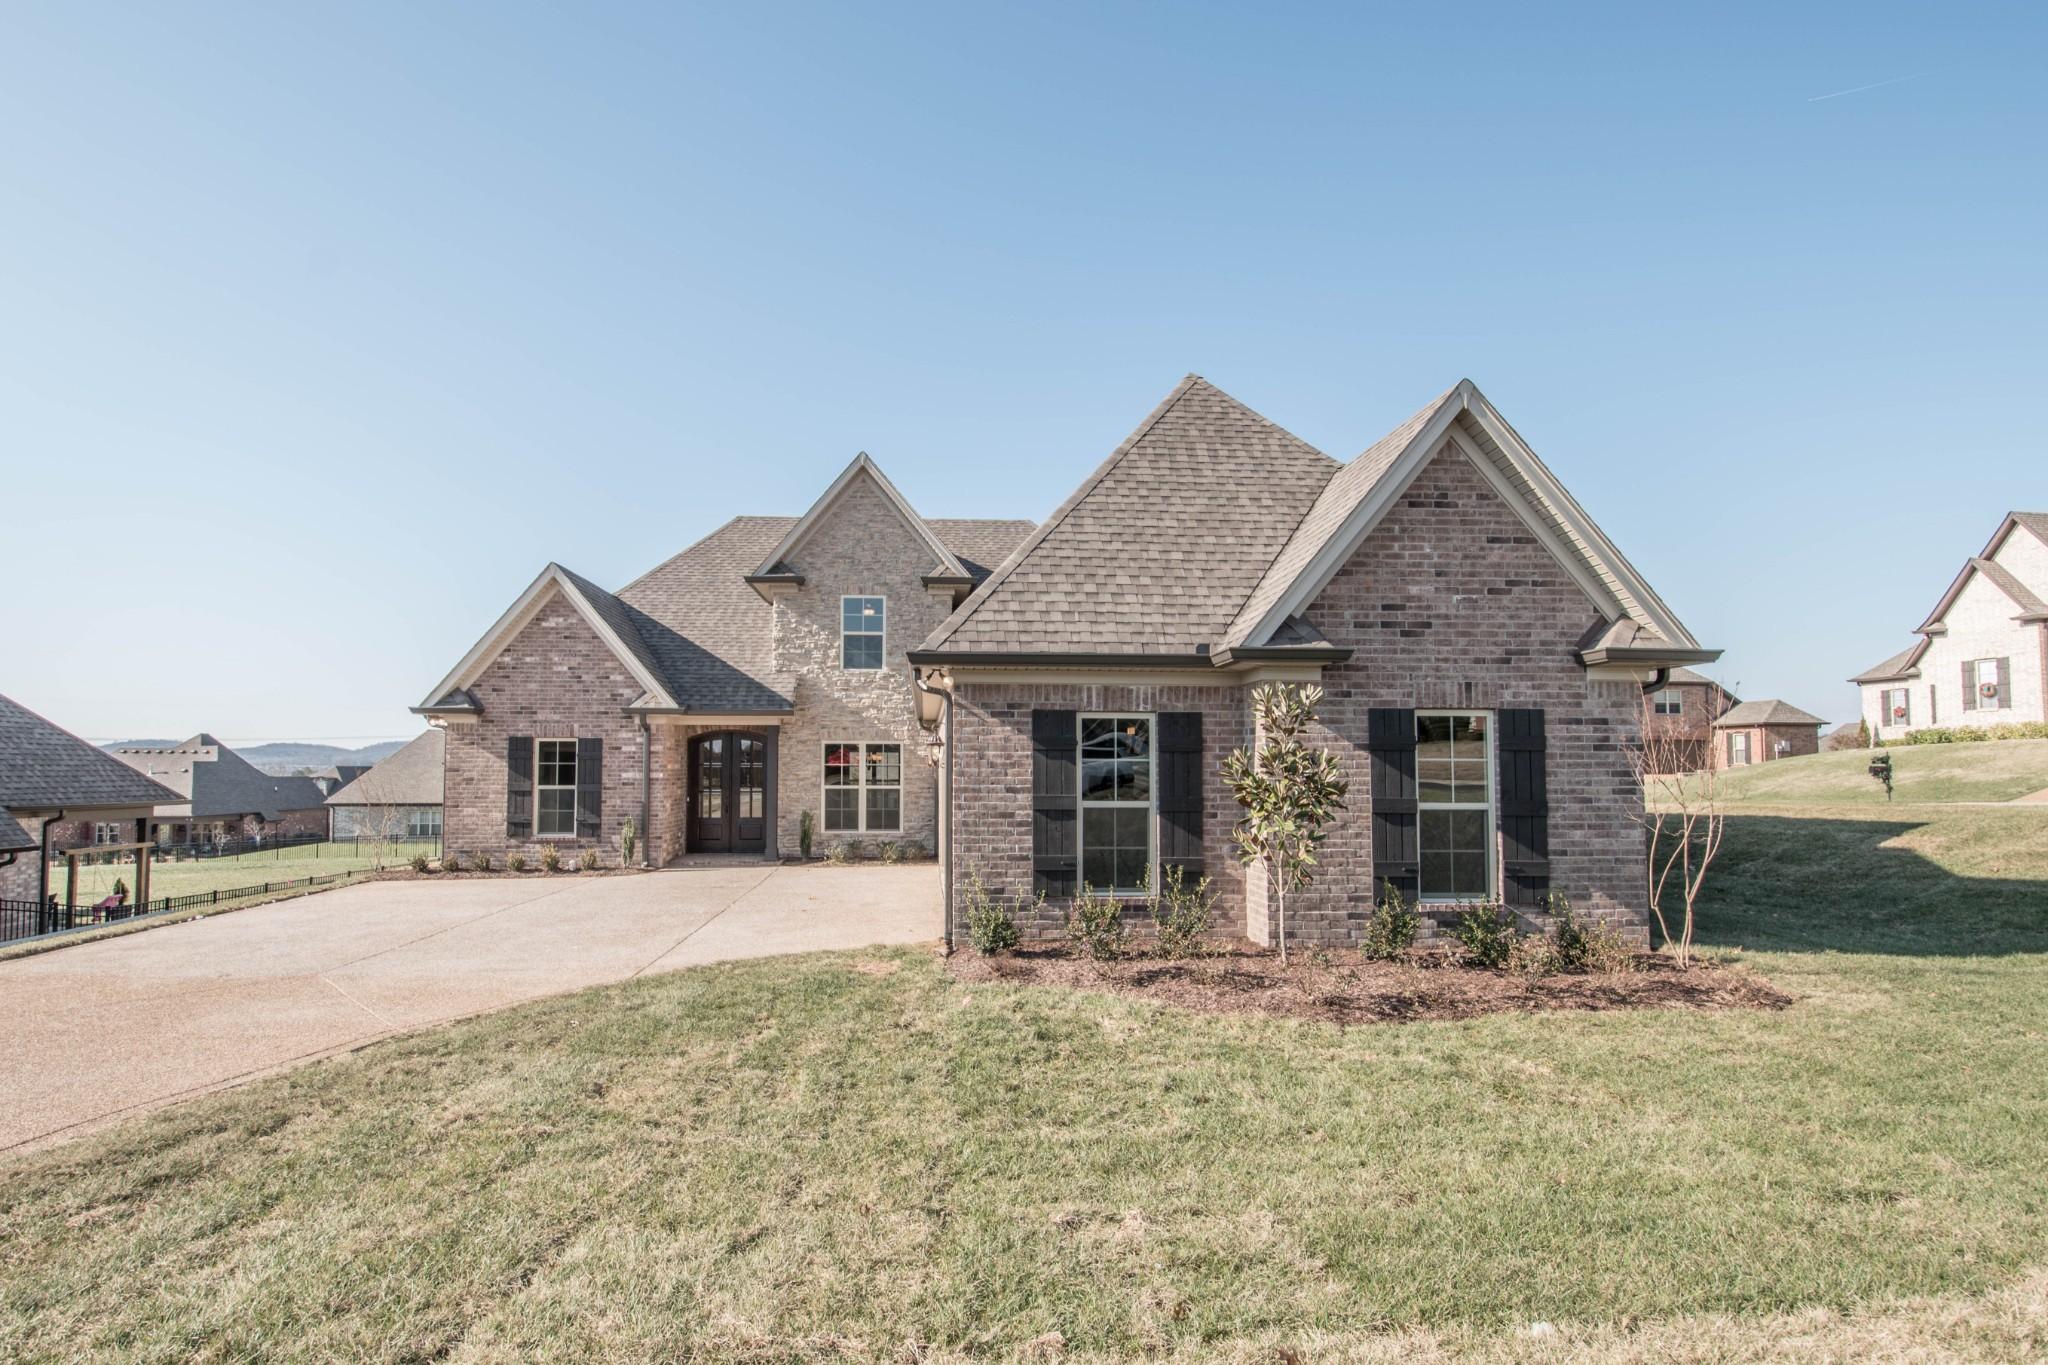 2079 Hawkwell Cir Property Photo - Hendersonville, TN real estate listing